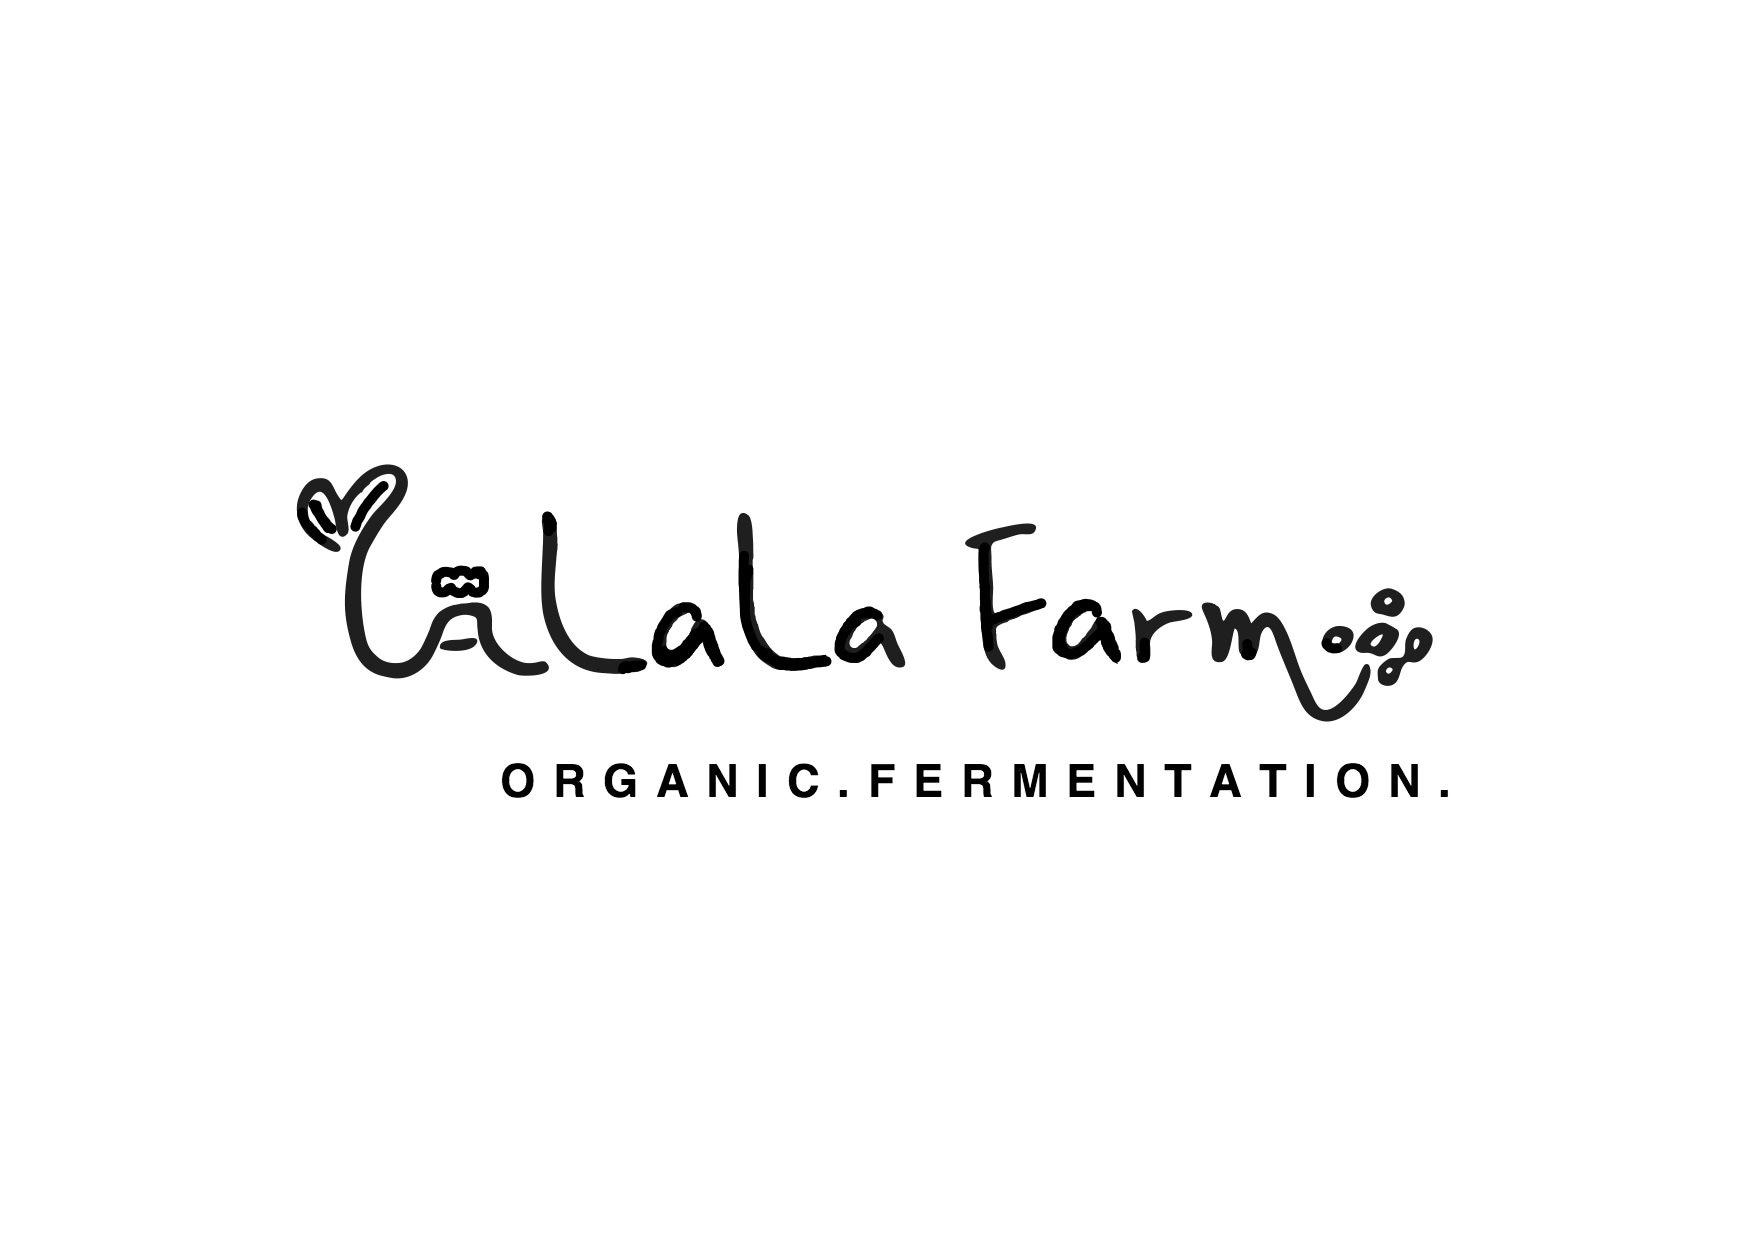 LaLaLaFarmオンライン発酵講座 vol.0「自然から発想したこと」2月11日のイメージその1